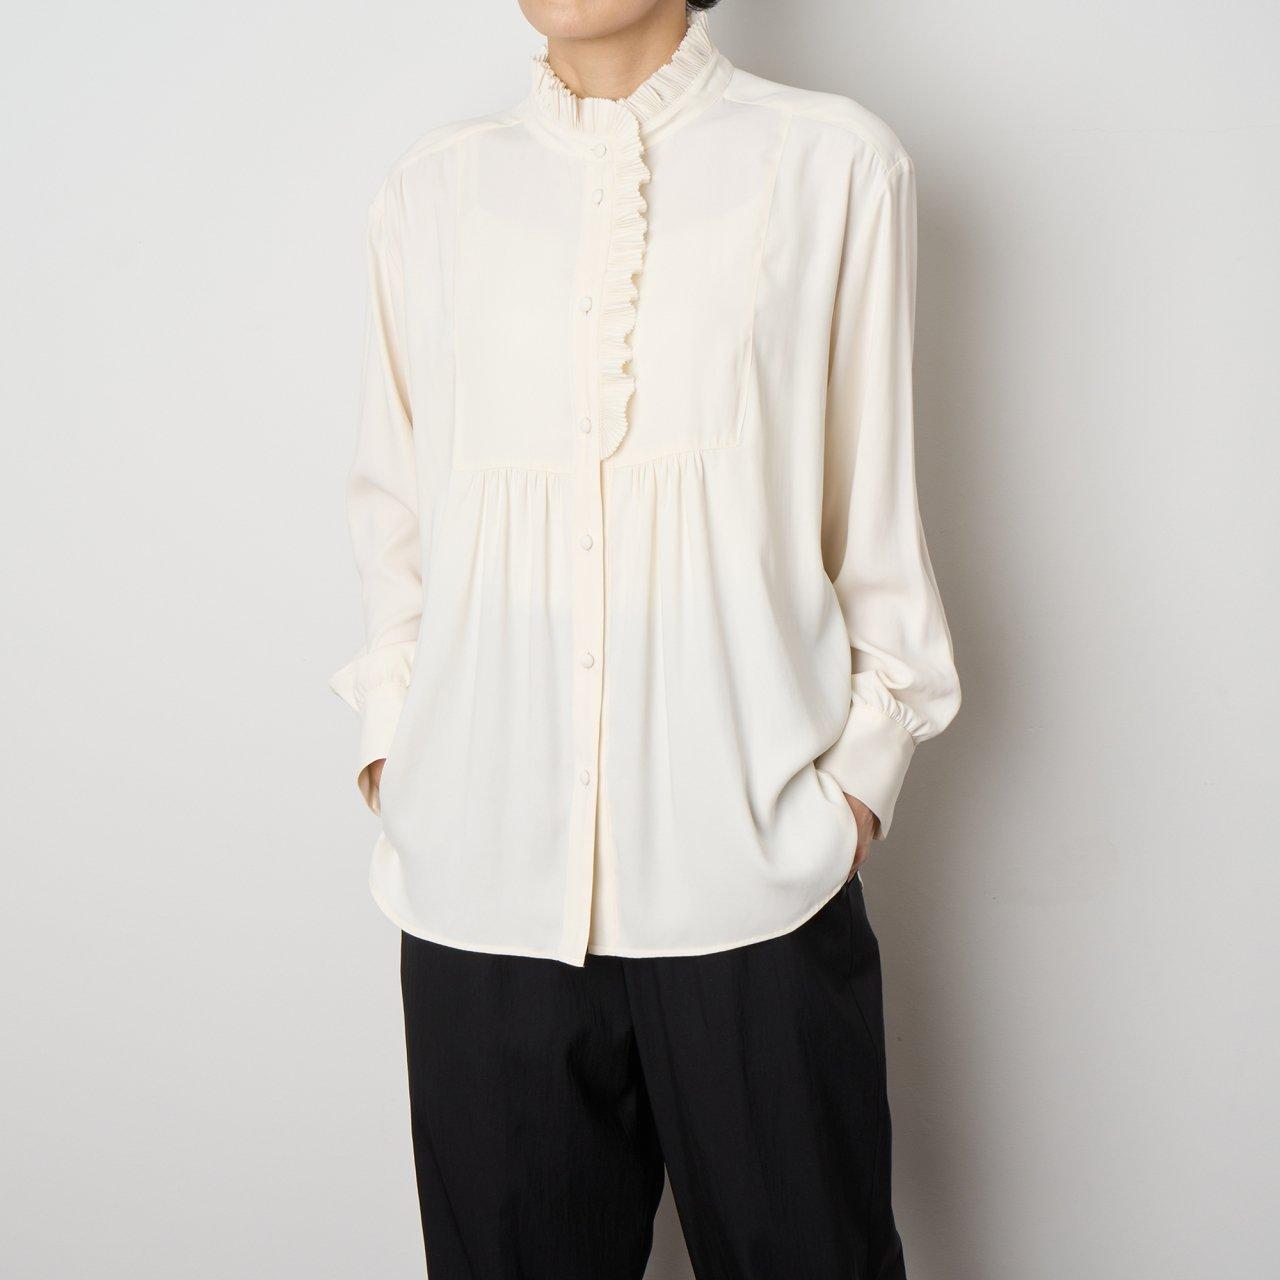 PaleJute<BR>Pleated blouse sophie<BR>vanilla white